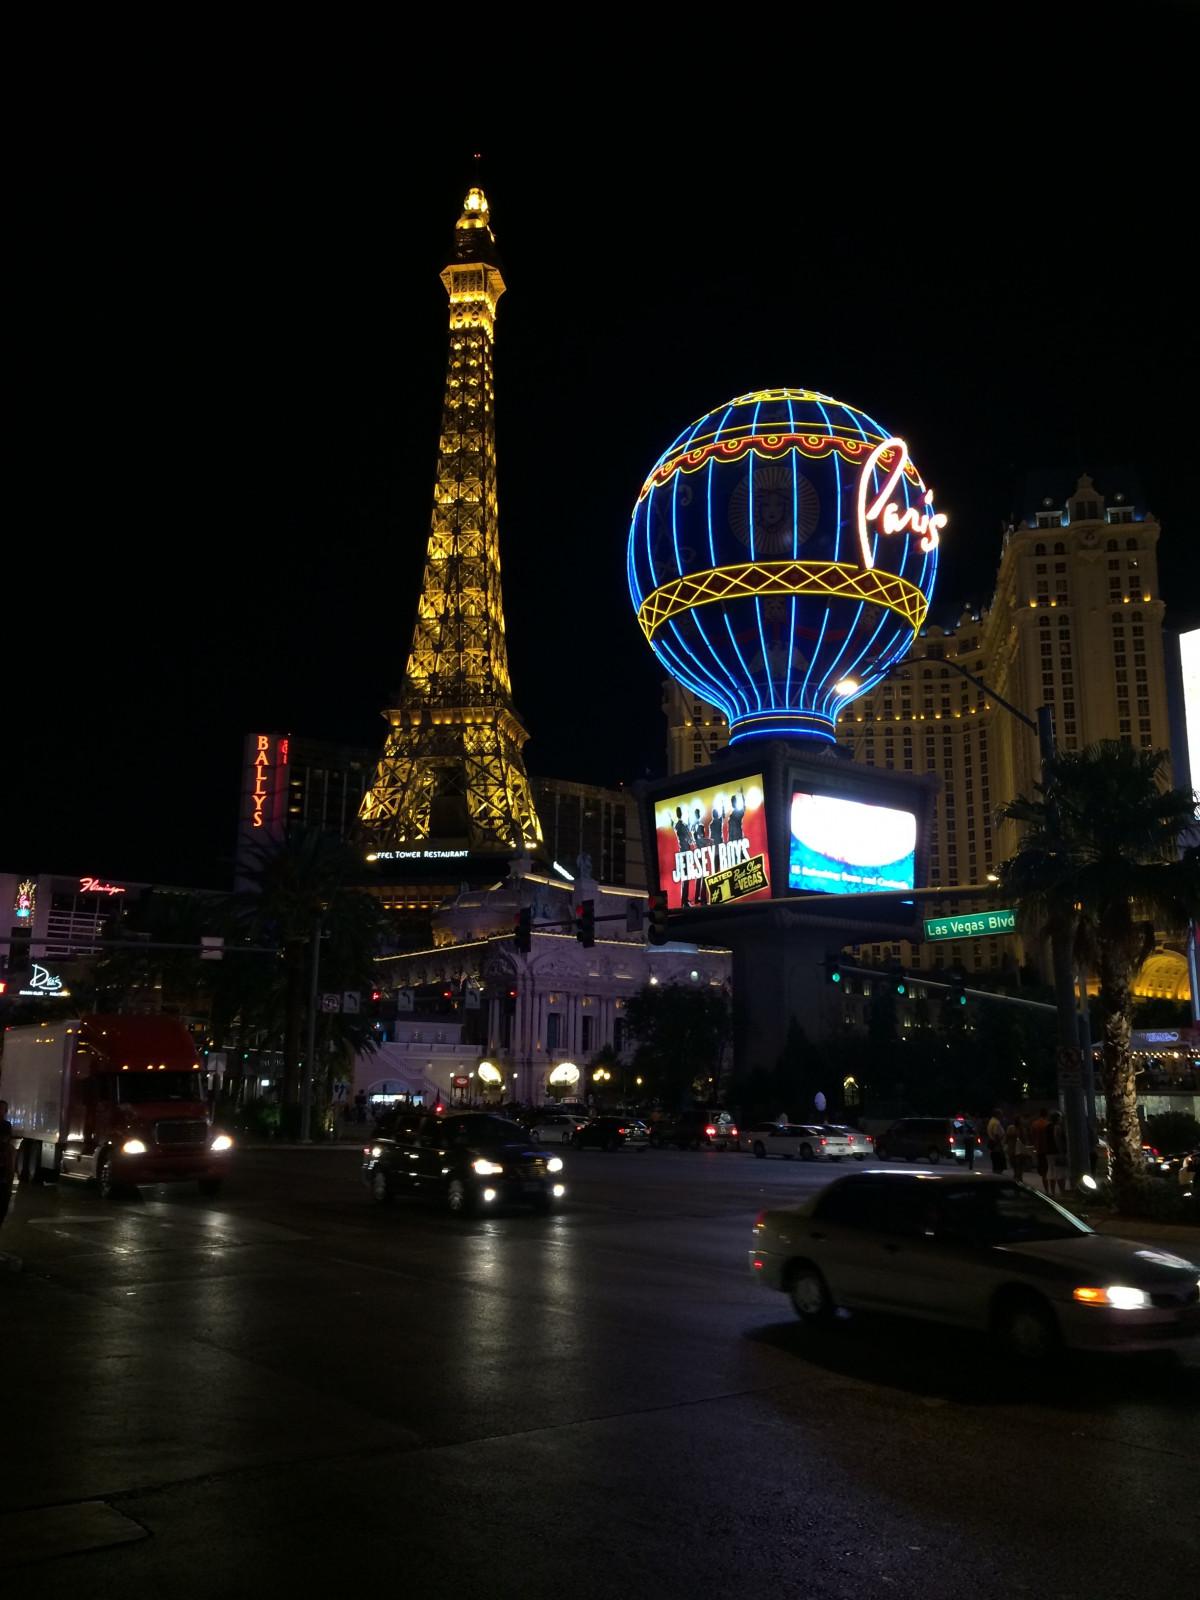 Las- Vegasstreifen-Nachtszene Redaktionelles Bild - Bild